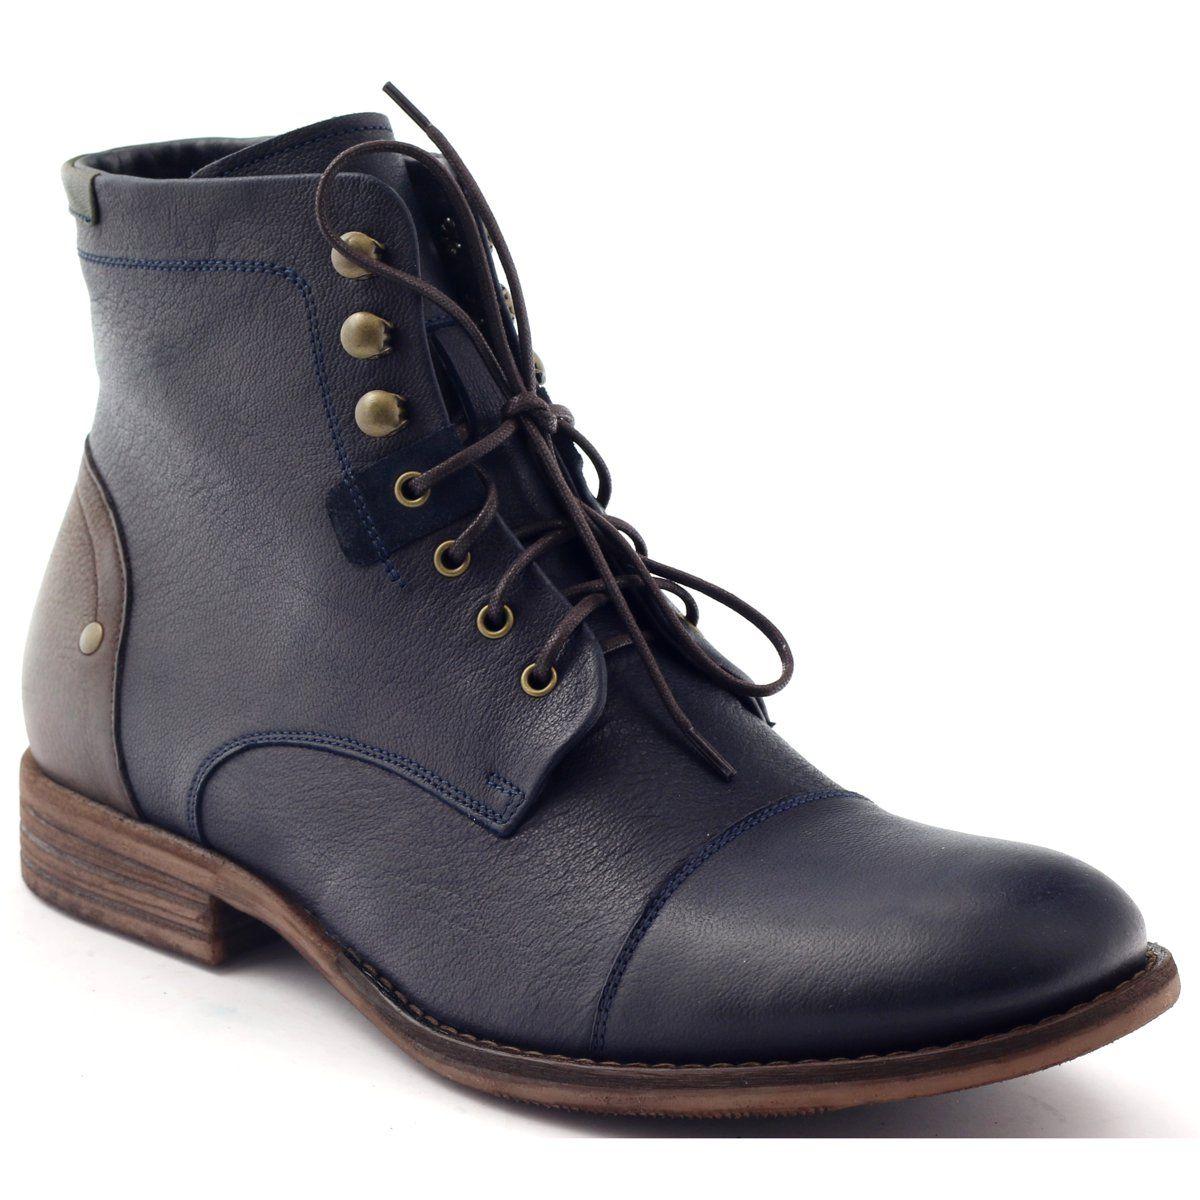 Botki Meskie Zimowe Pilpol C831 Granatowe Brazowe Combat Boots Boots Dr Martens Boots